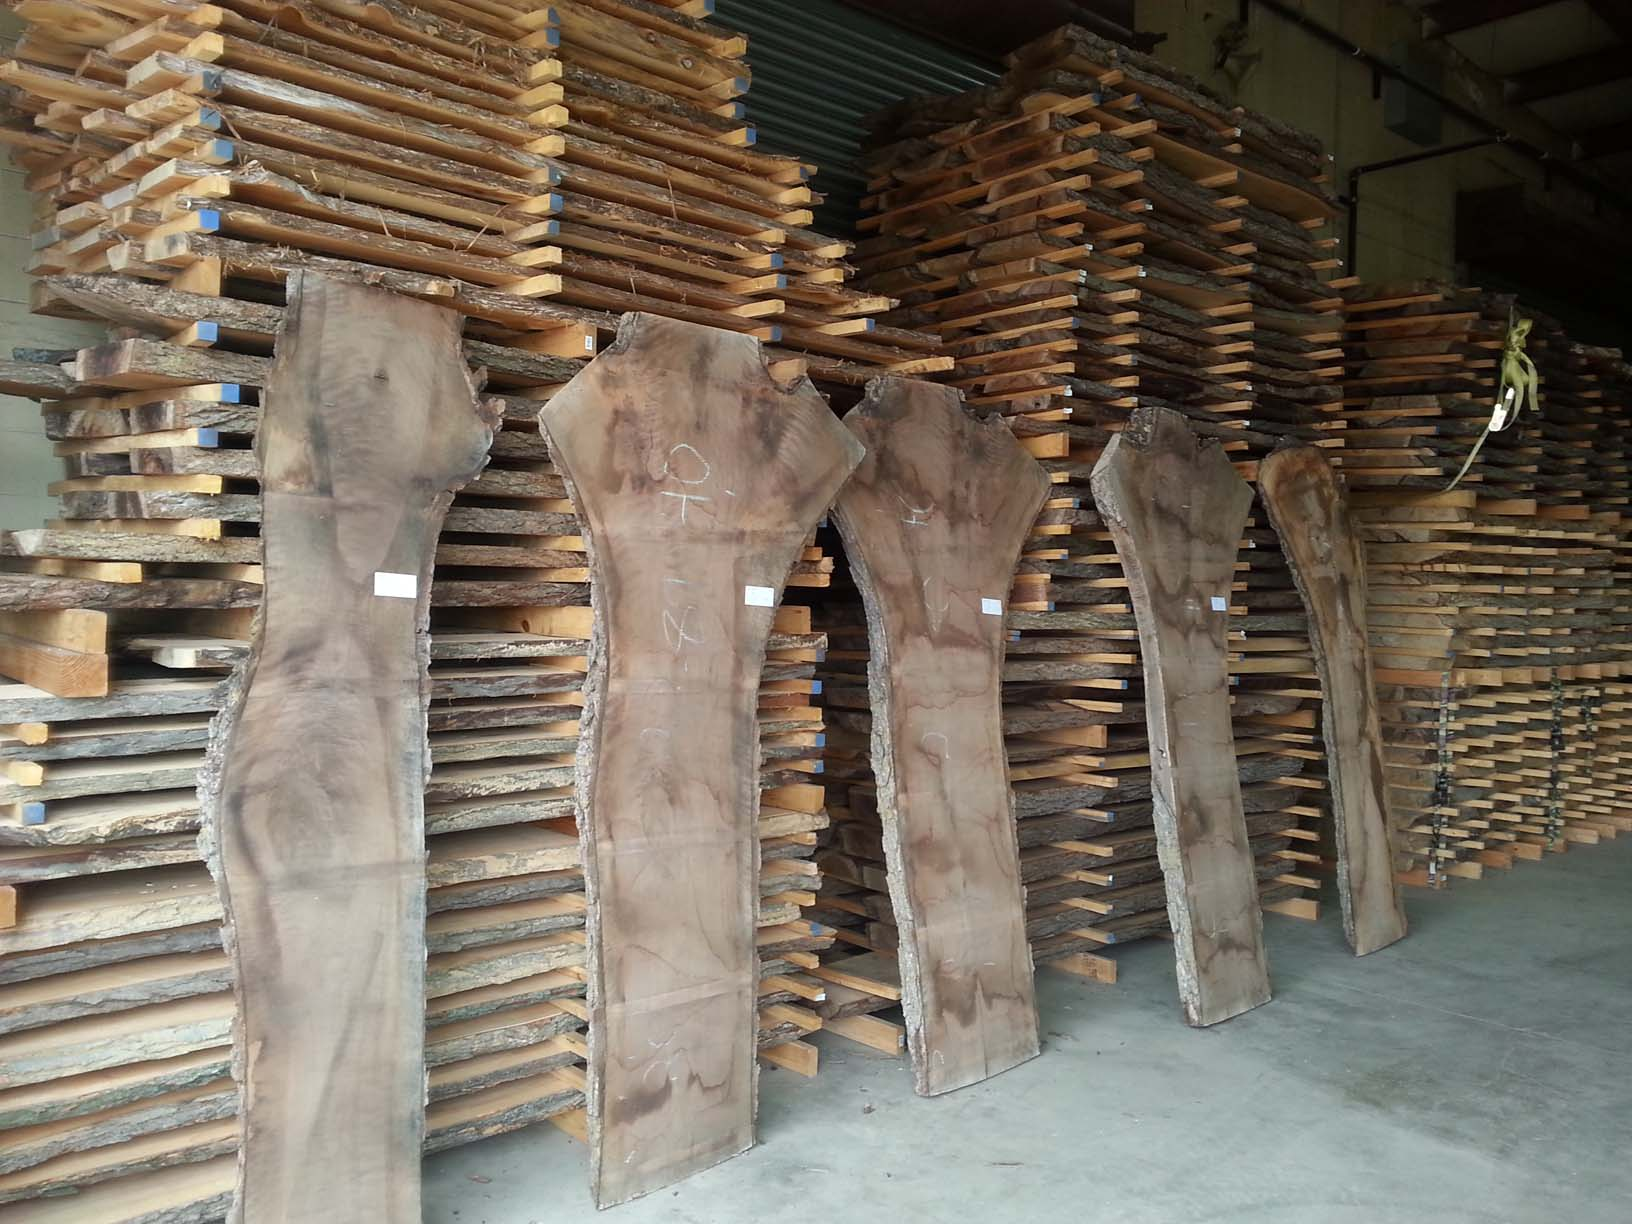 Rfprg 2 Dry Red Gum Eucalyptus Lumber Board 30 3 4 X11 8 1 X2